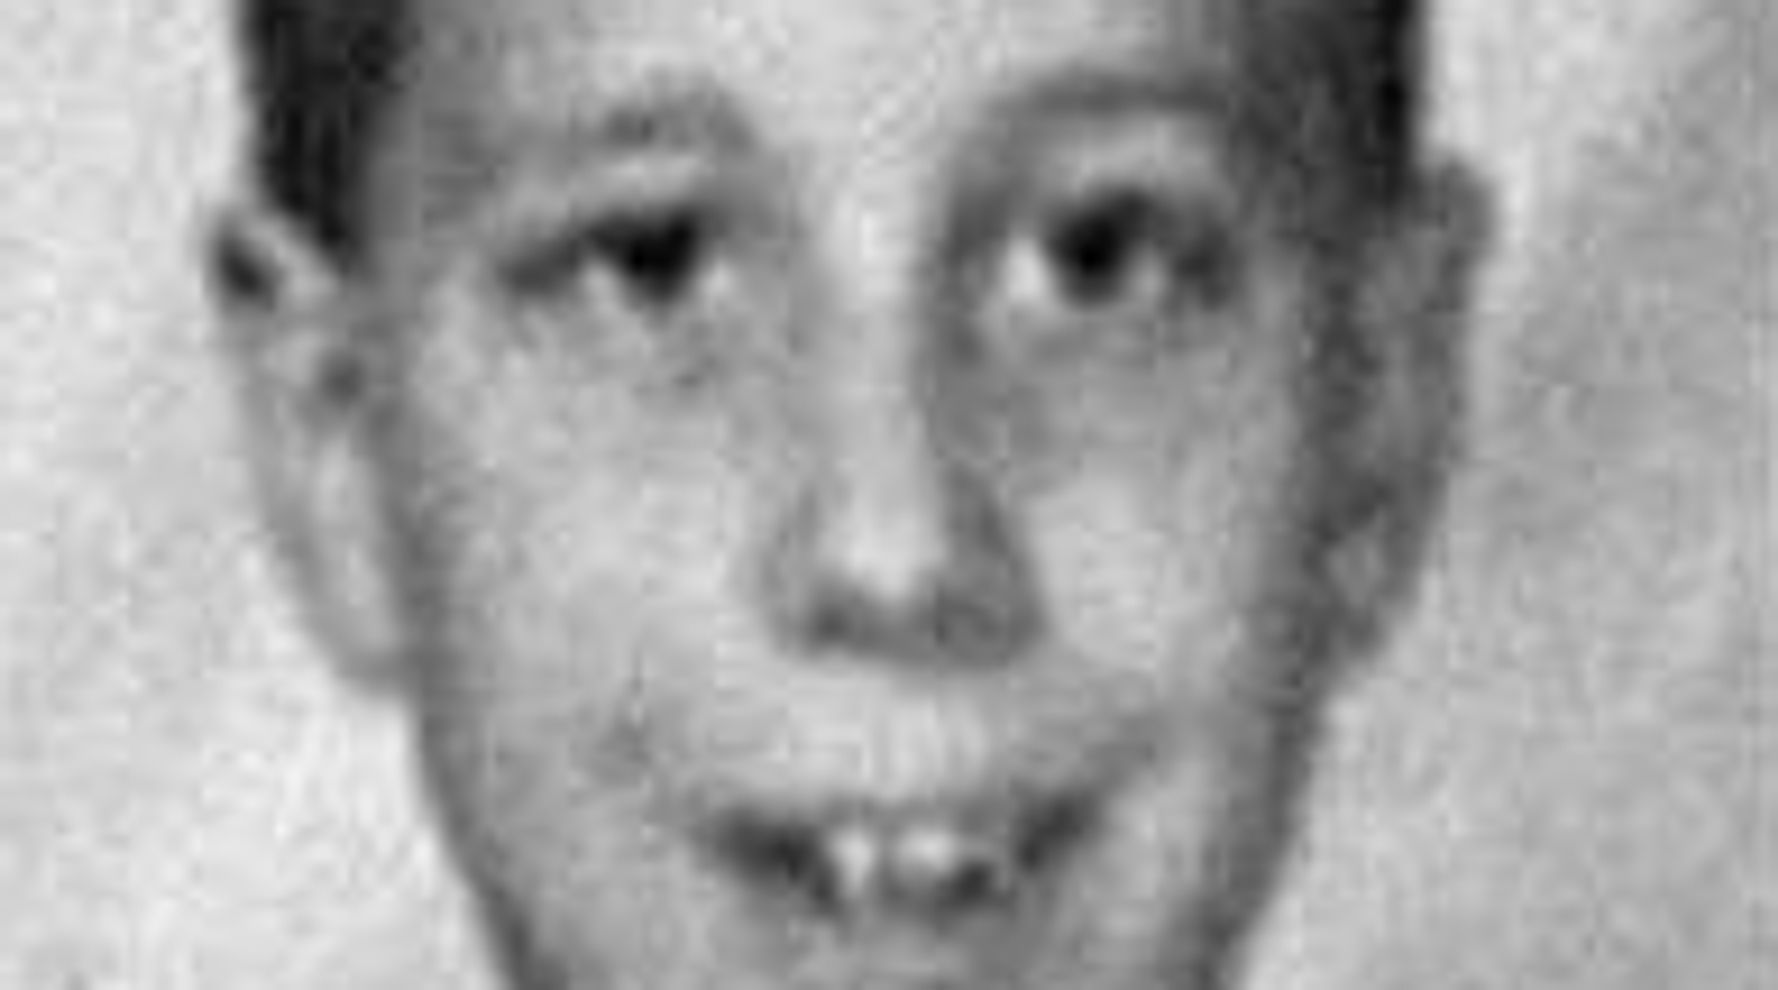 School Shooter Andrew Golden Killed In Car Crash 21 Years